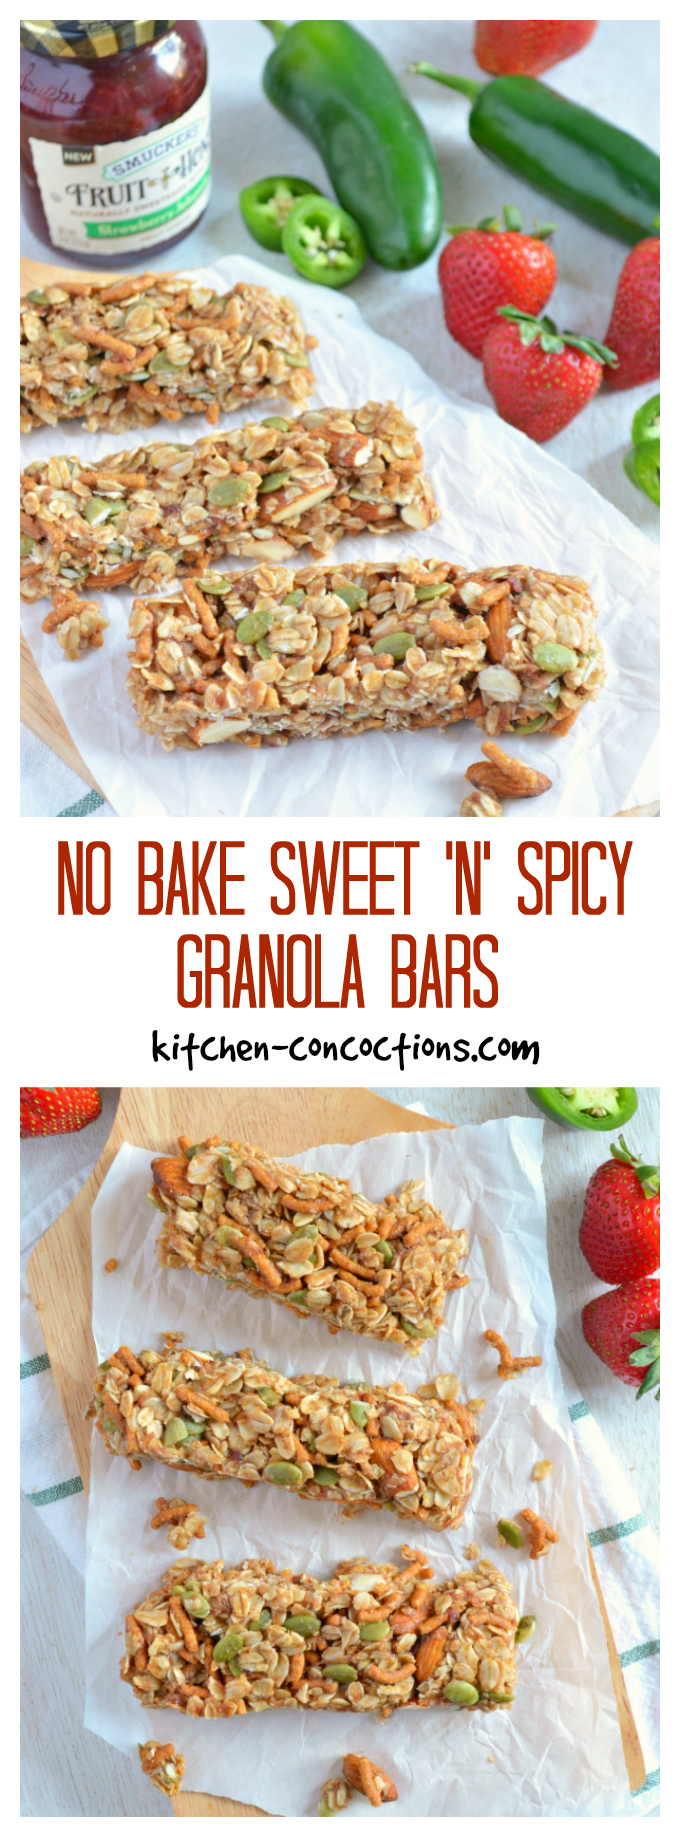 No Bake Sweet 'n' Spicy Granola Bars